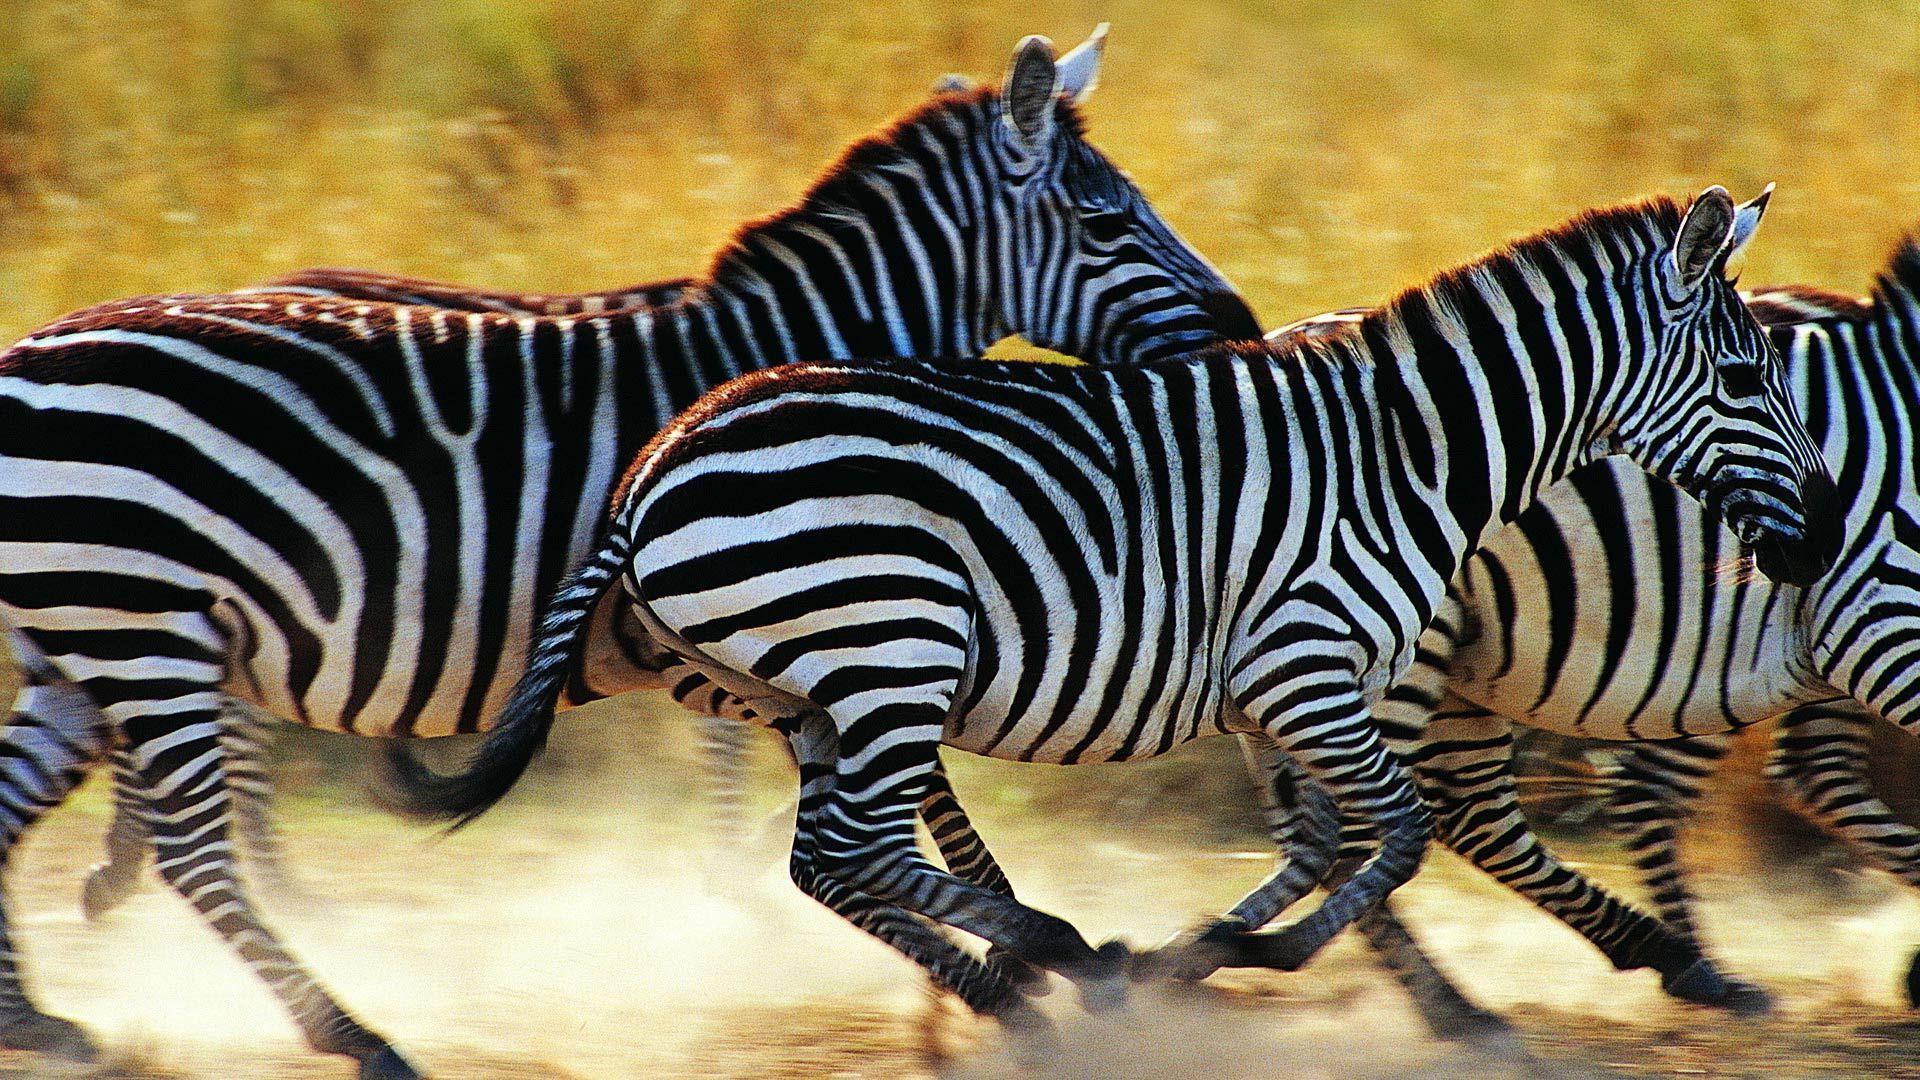 Zebra Photos Animal